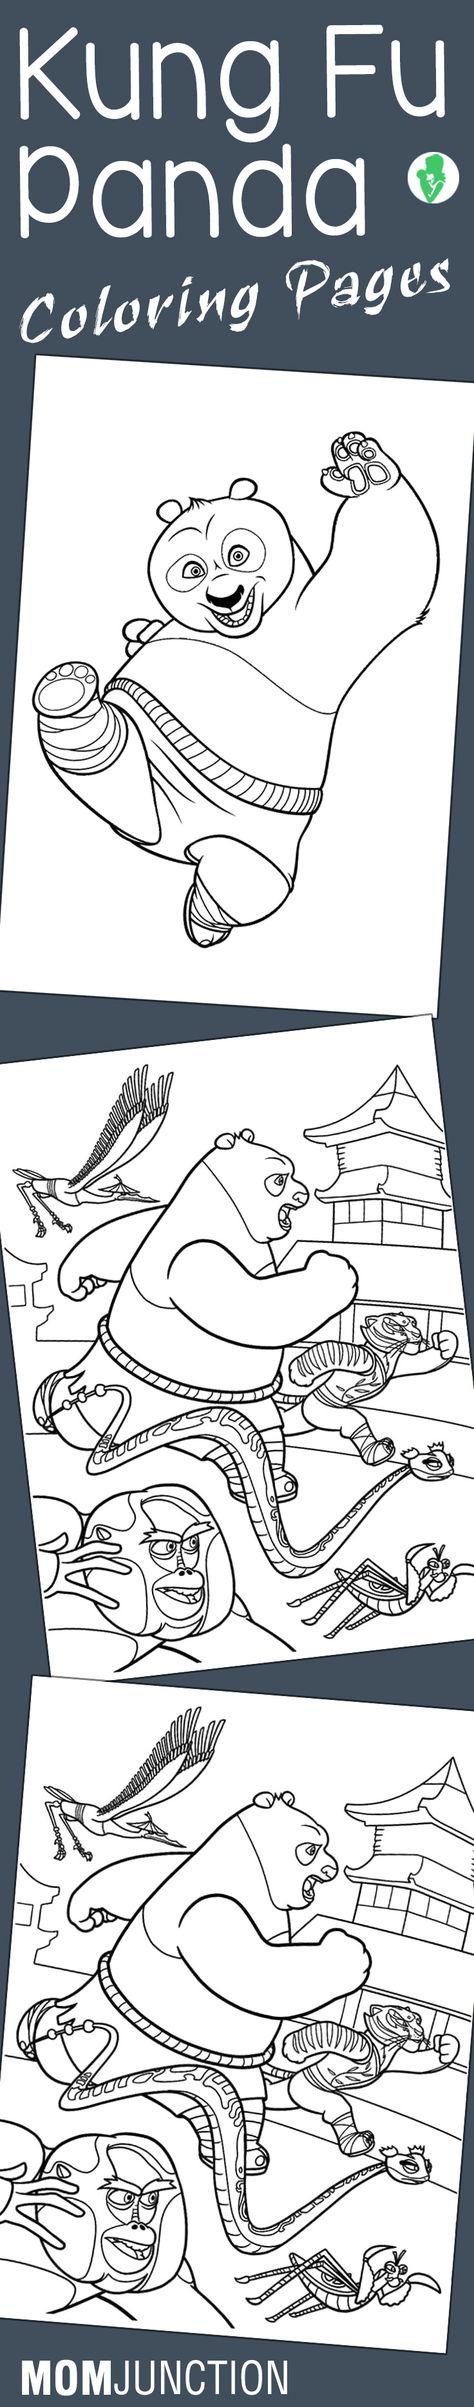 Printable coloring pages kung fu panda 2 - Printable Kung Fu Panda Inspirational Quote Kung Fu Panda Kung Fu And Printable Quotes